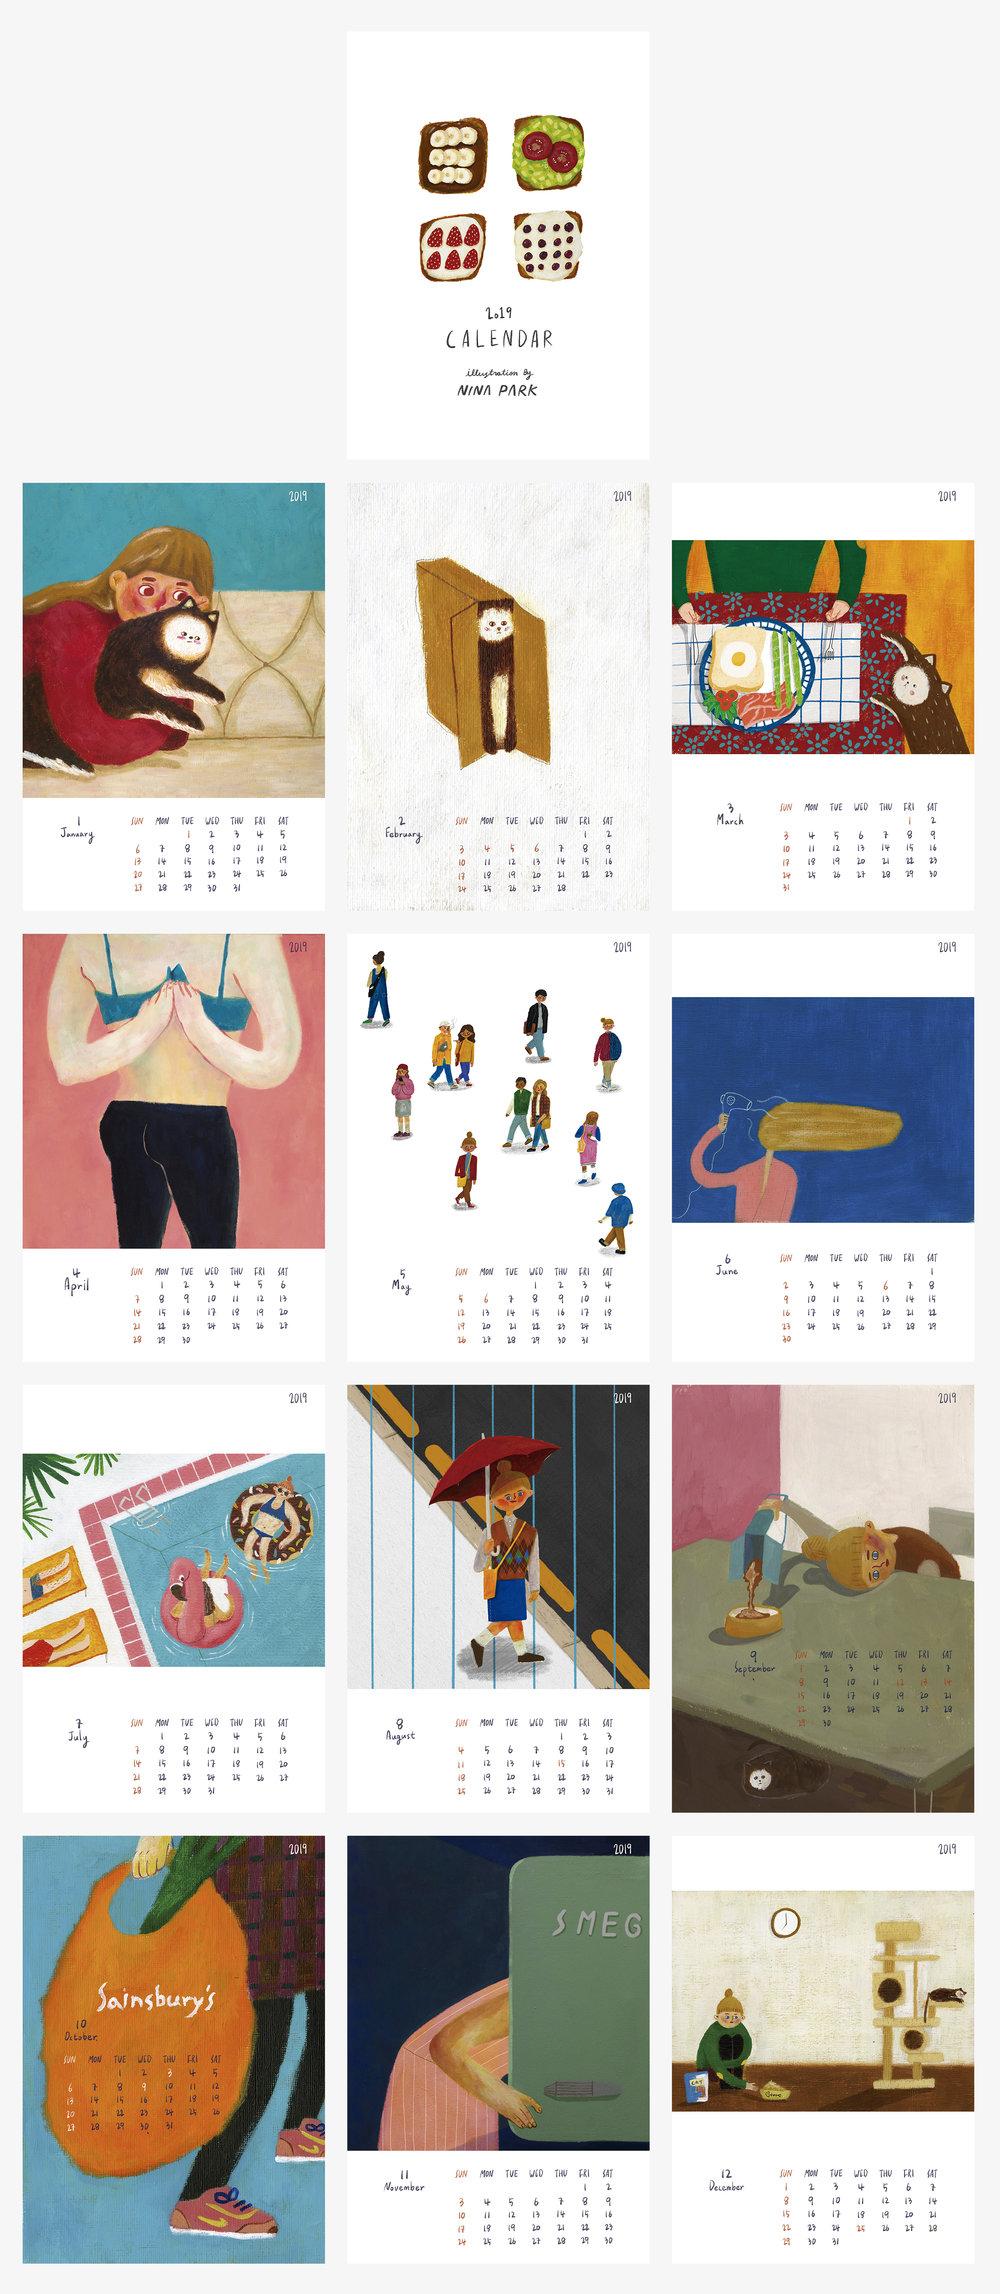 calendar sample.jpg